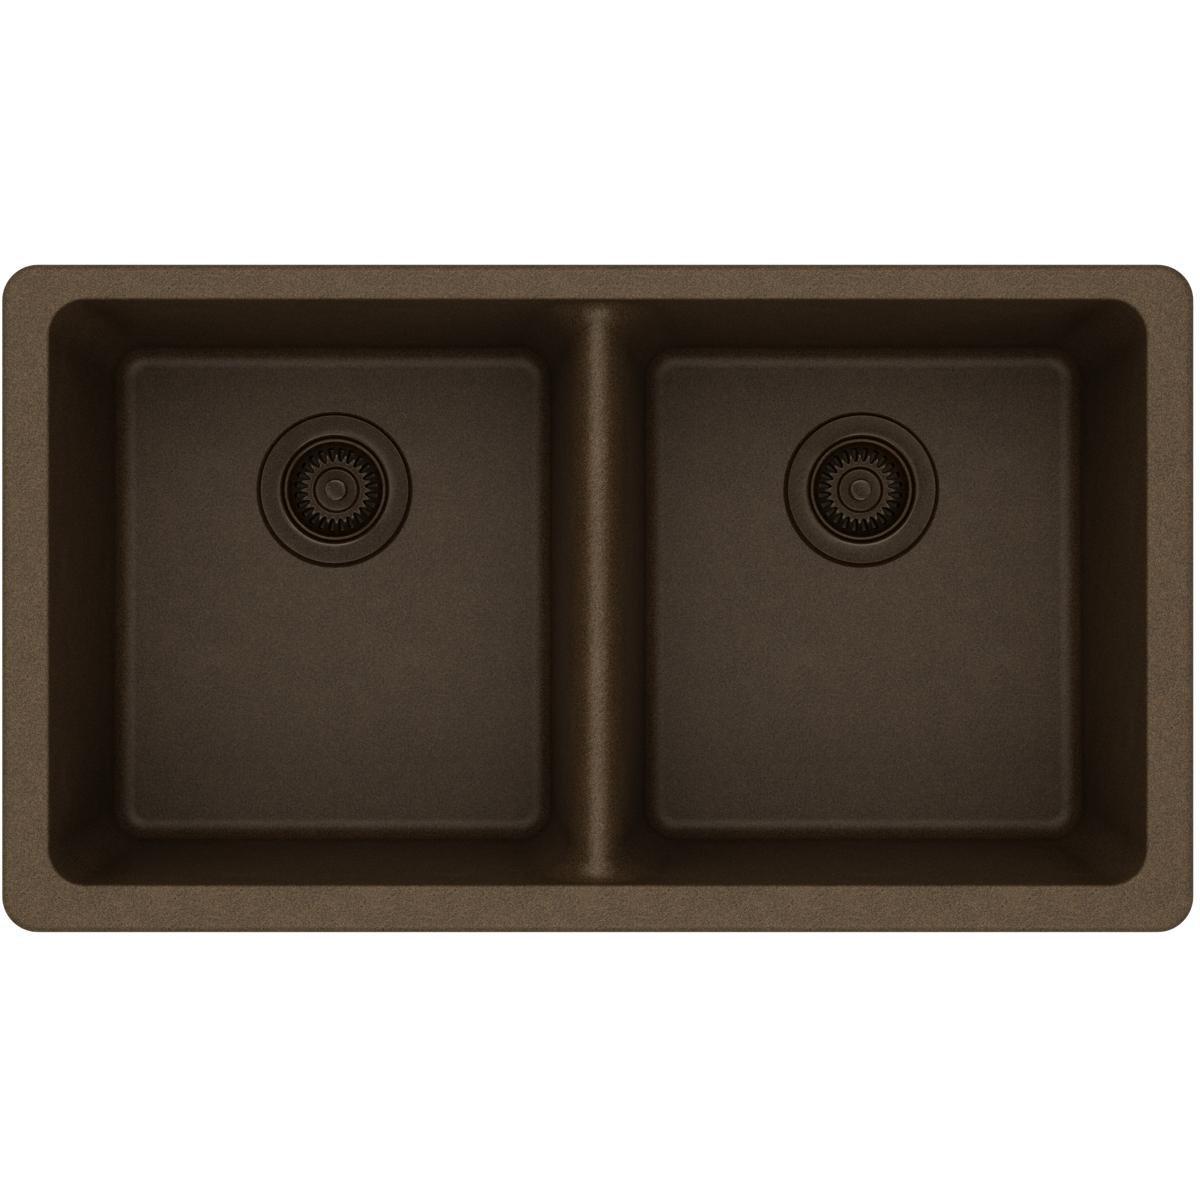 Elkay ELGU3322MC0 Gourmet Quartz Classic Undermount Sink, Mocha